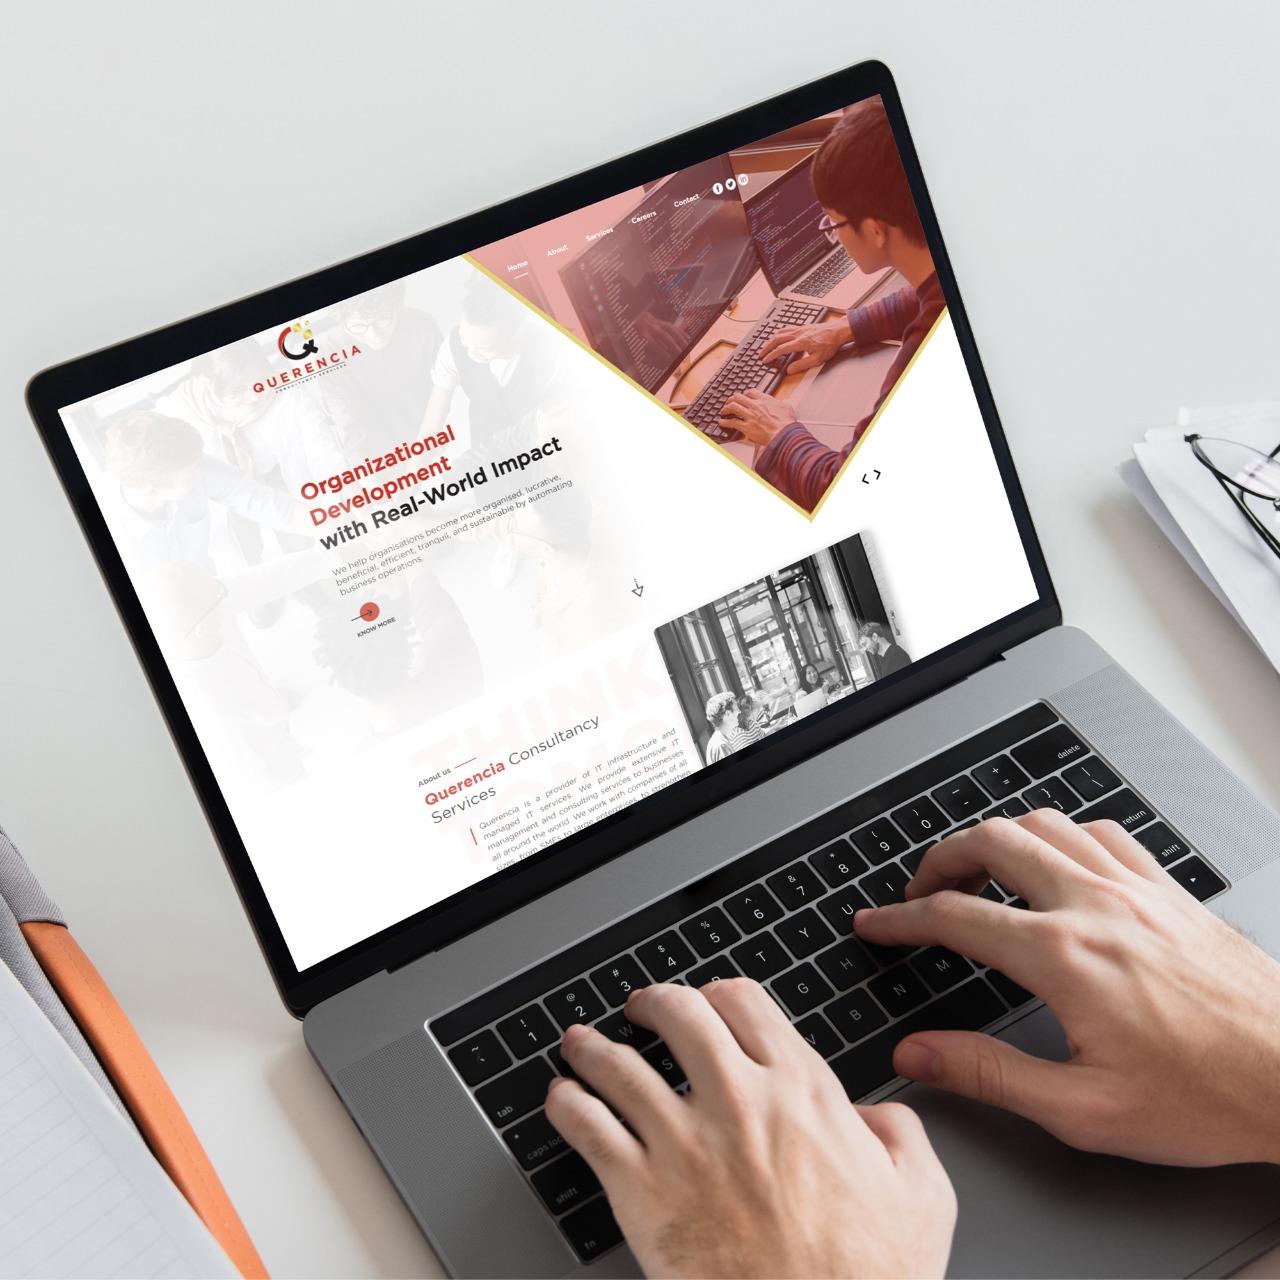 Website Designing for Querencia Consultancy in London, UK